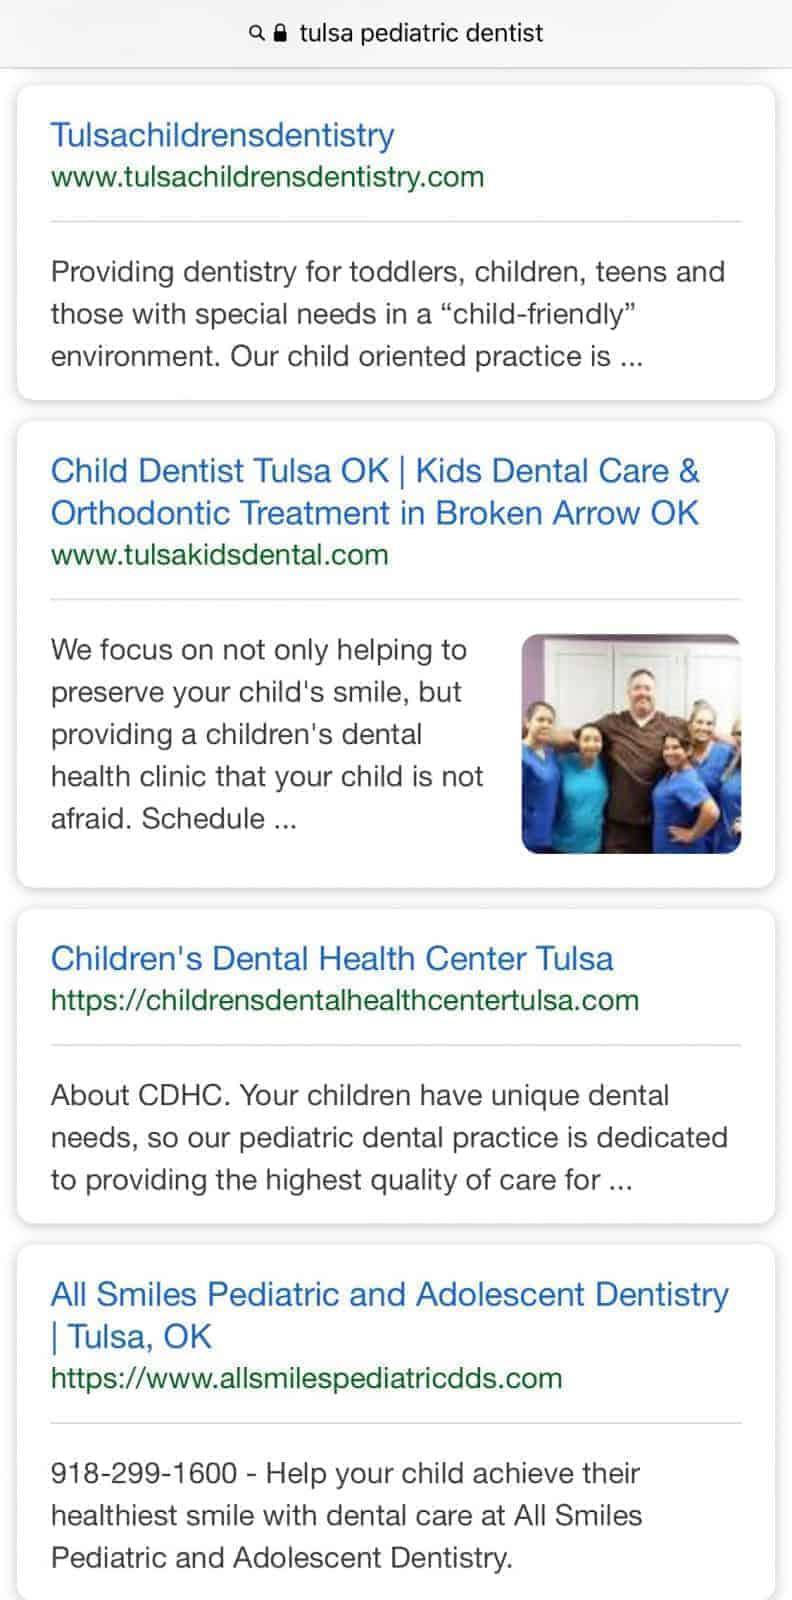 tulsa pediatric dentist